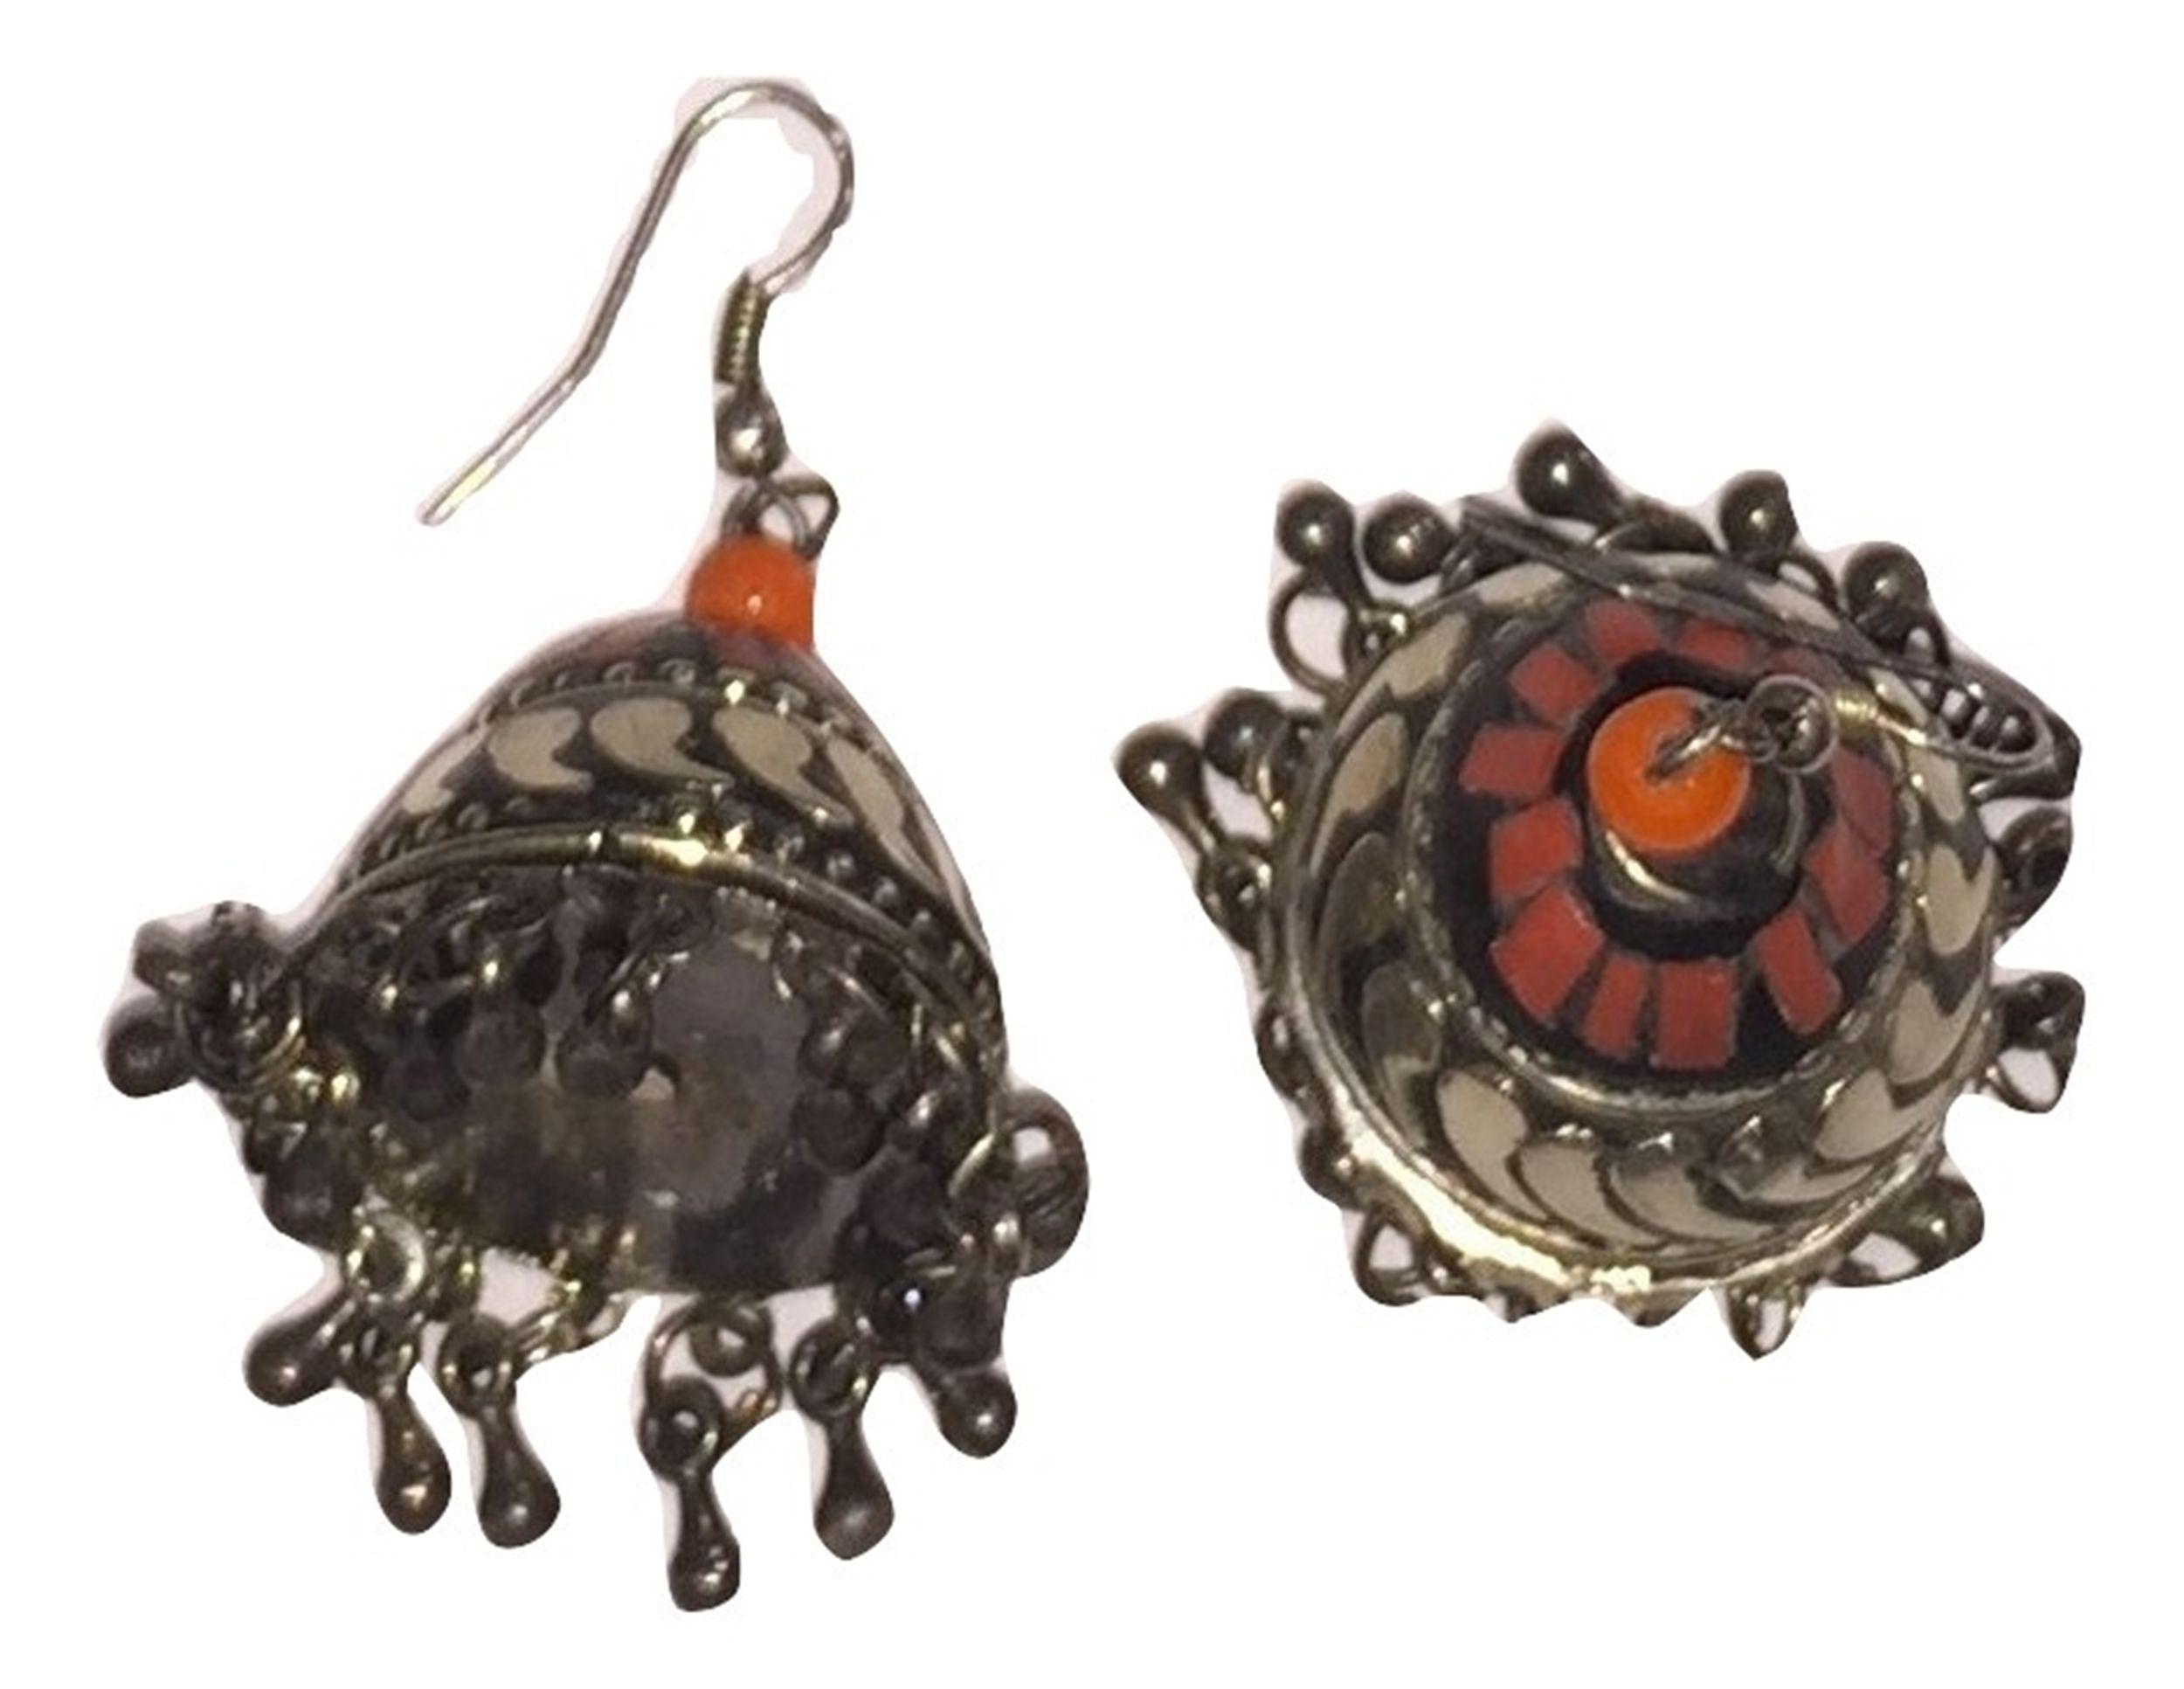 Jhumka Zumka Jhumki Earrings Dangle Drop Ethnic Imitation Pearl Women Jewellery Wholesale Seller